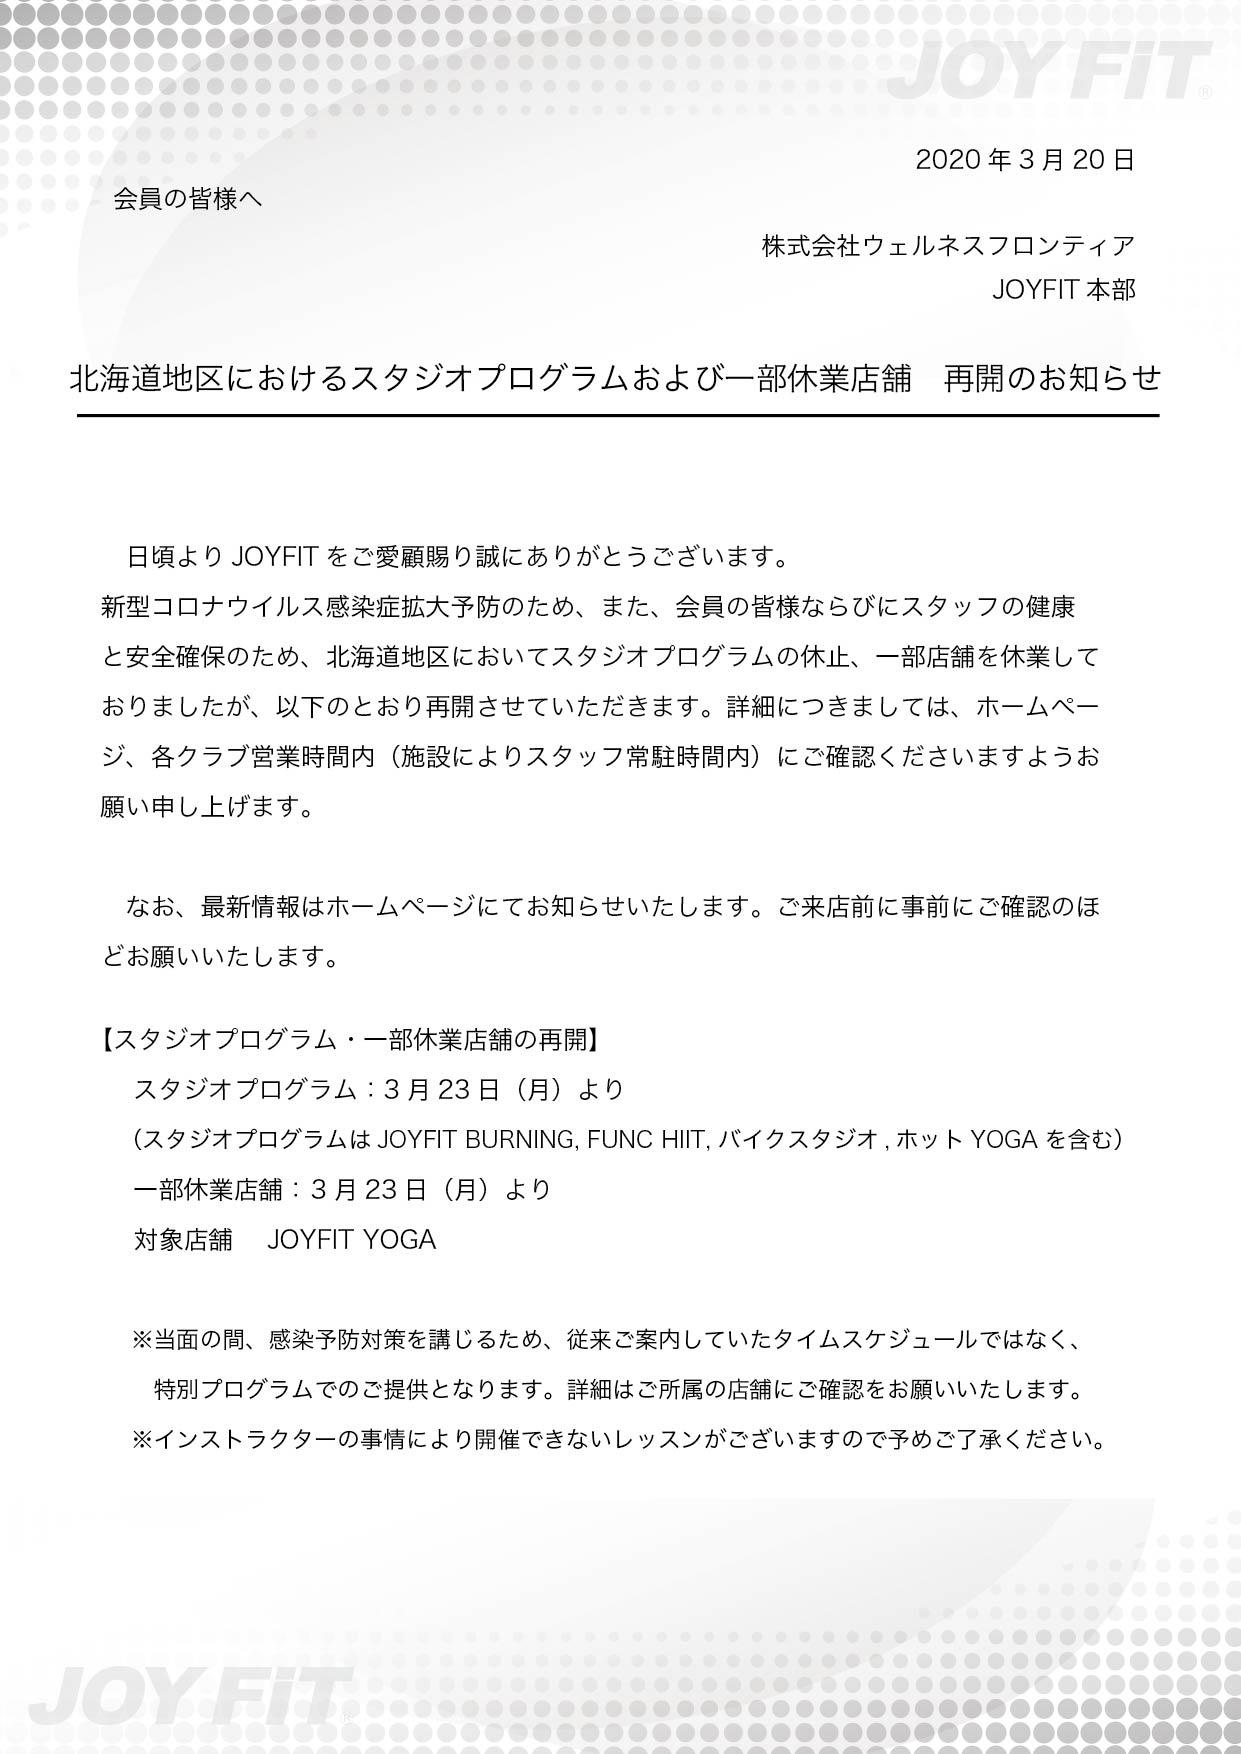 ⑬【JOYFIT】スタジオ・休業店舗・相互利用サービス再開のお知らせ(HP・館内POP・アプリ用)★20200320★_アートボード 1